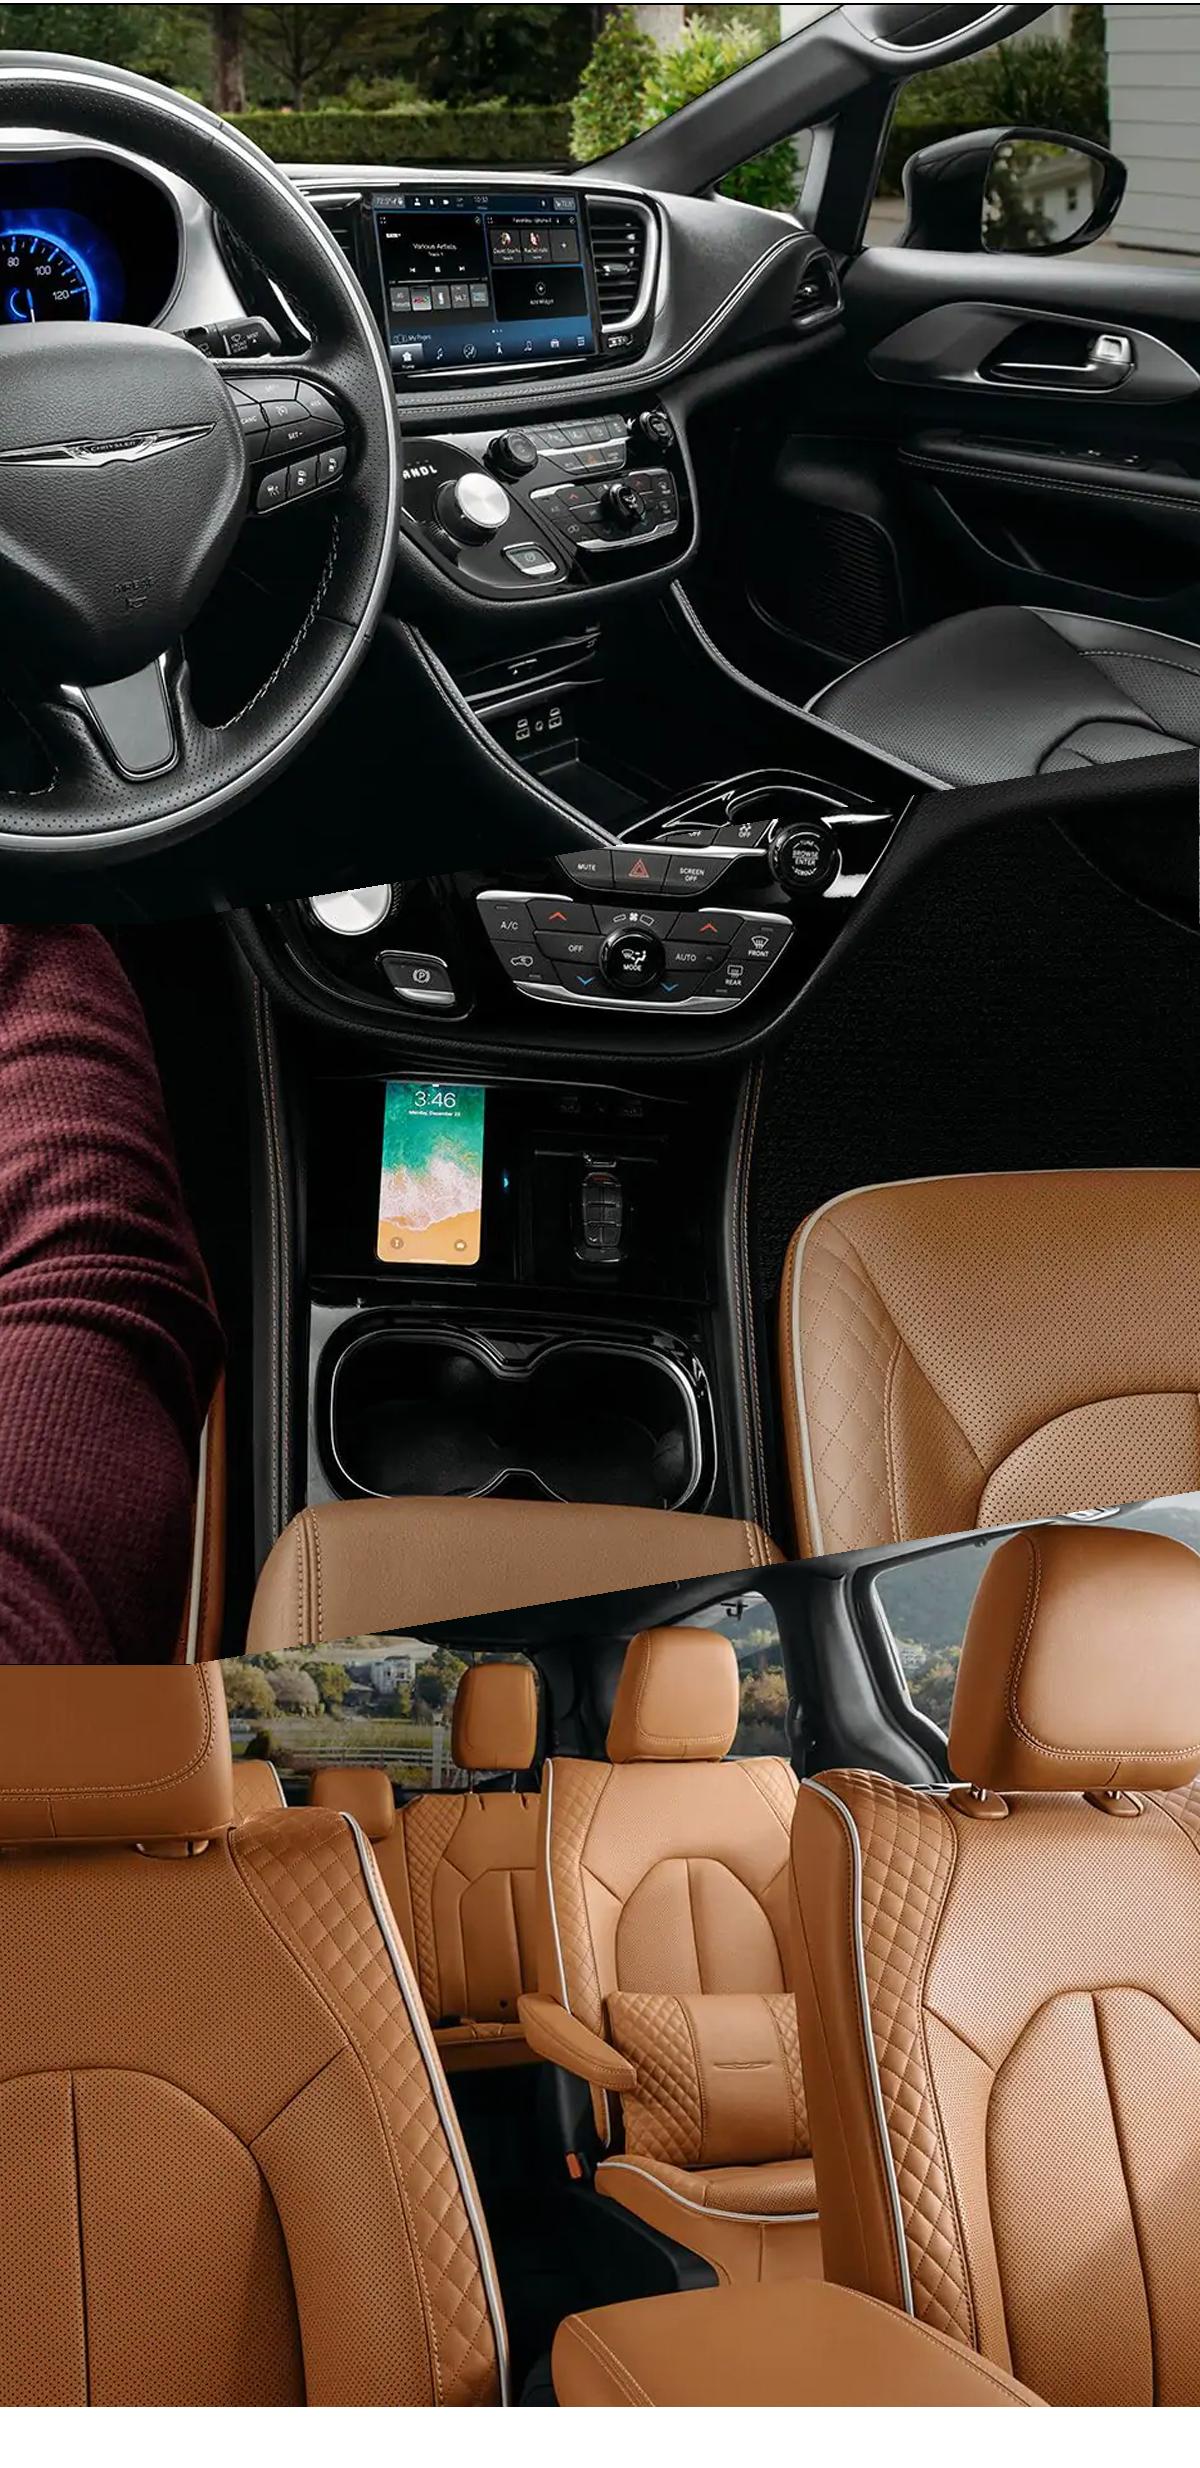 2021 Chrysler Pacifica Interior Andalusia, AL